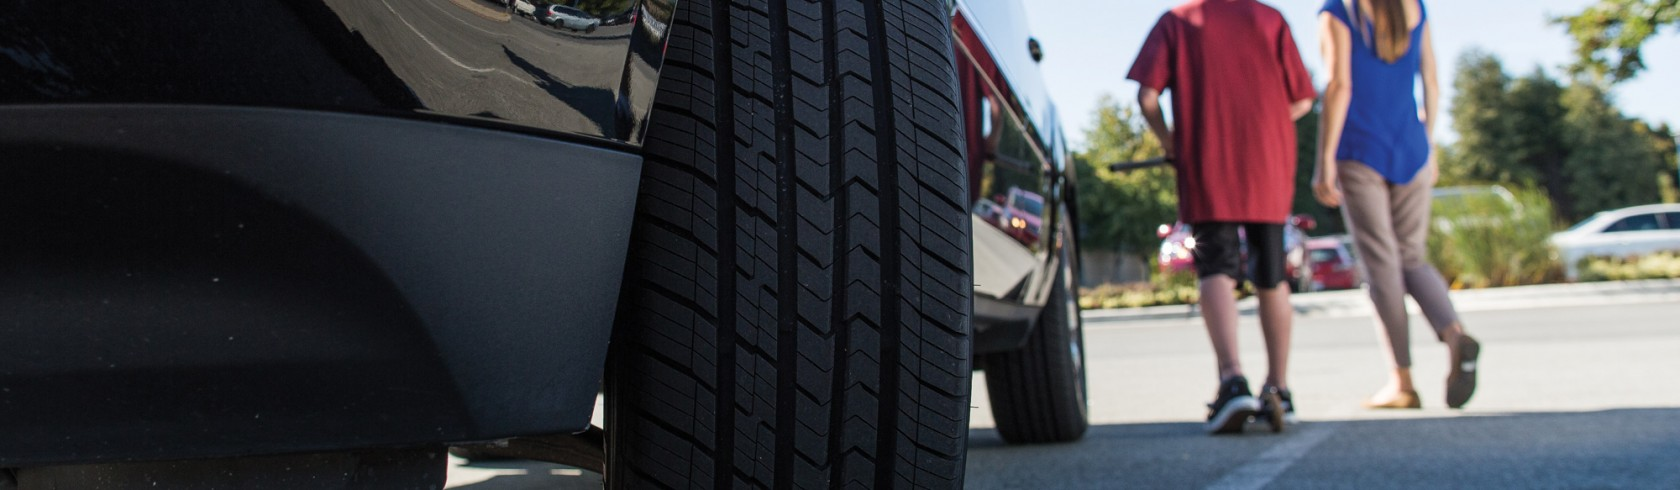 suv-tires.